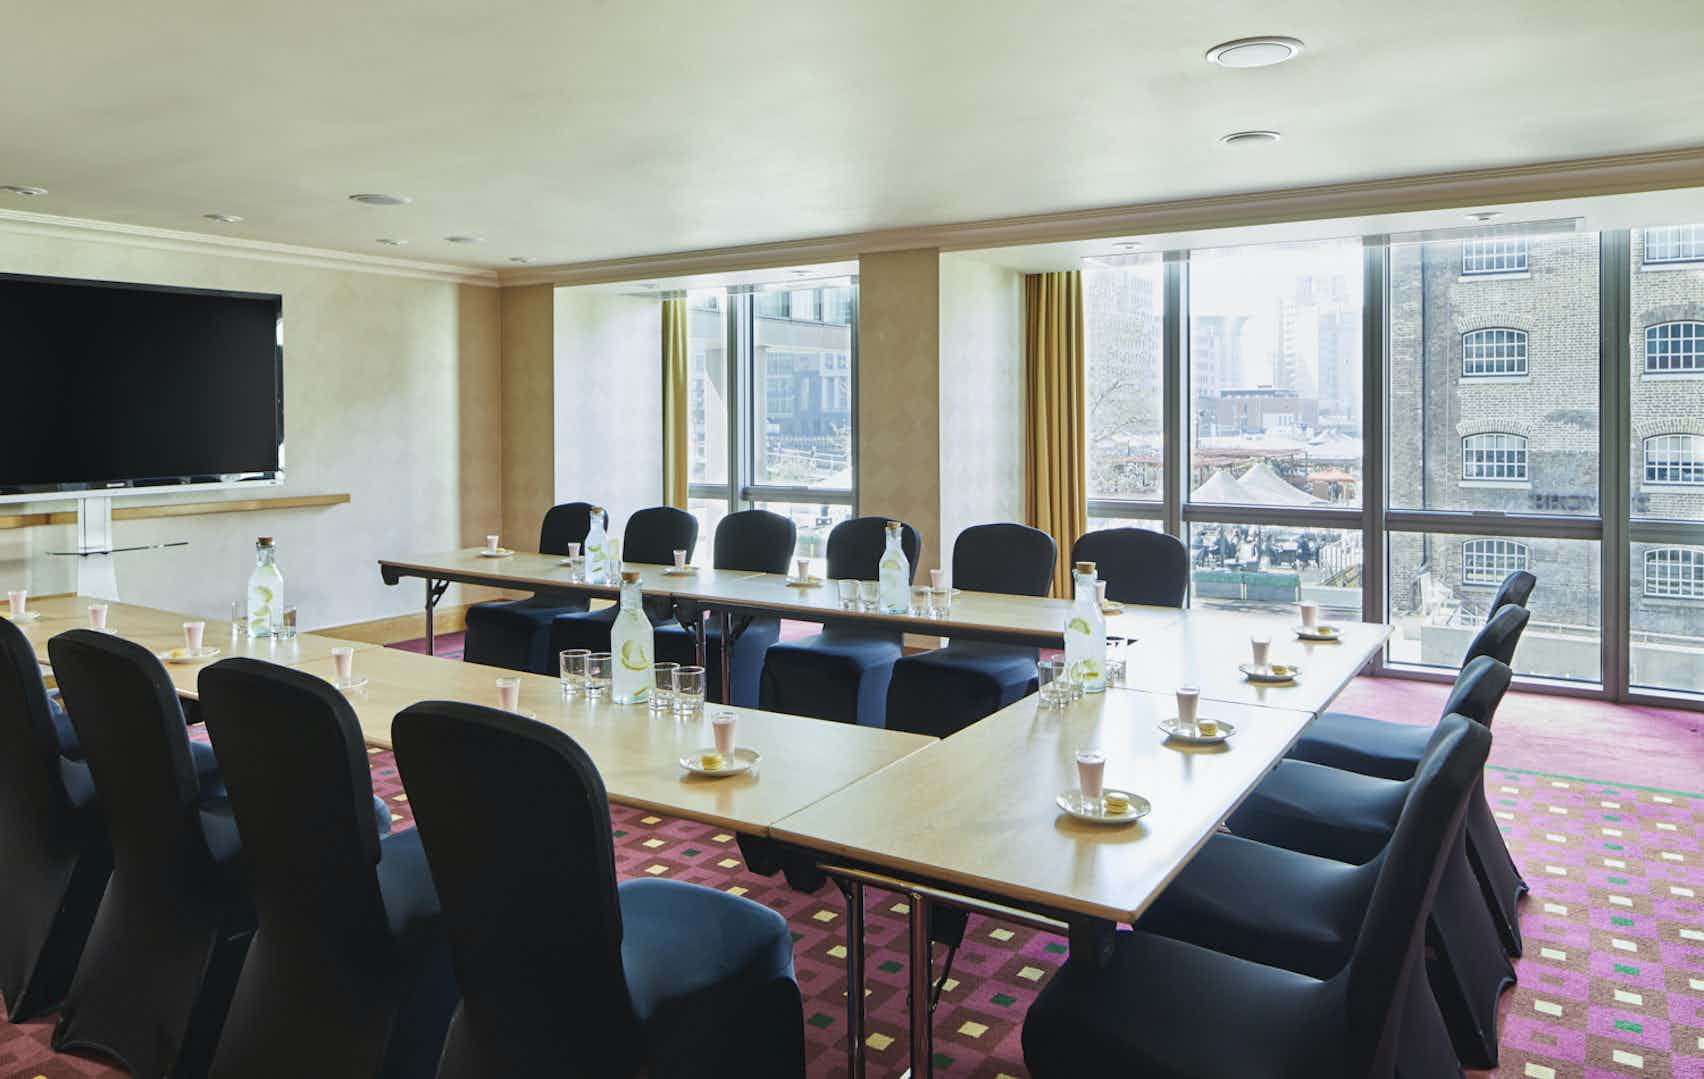 Rosewood Room, London Marriott Hotel Canary Wharf